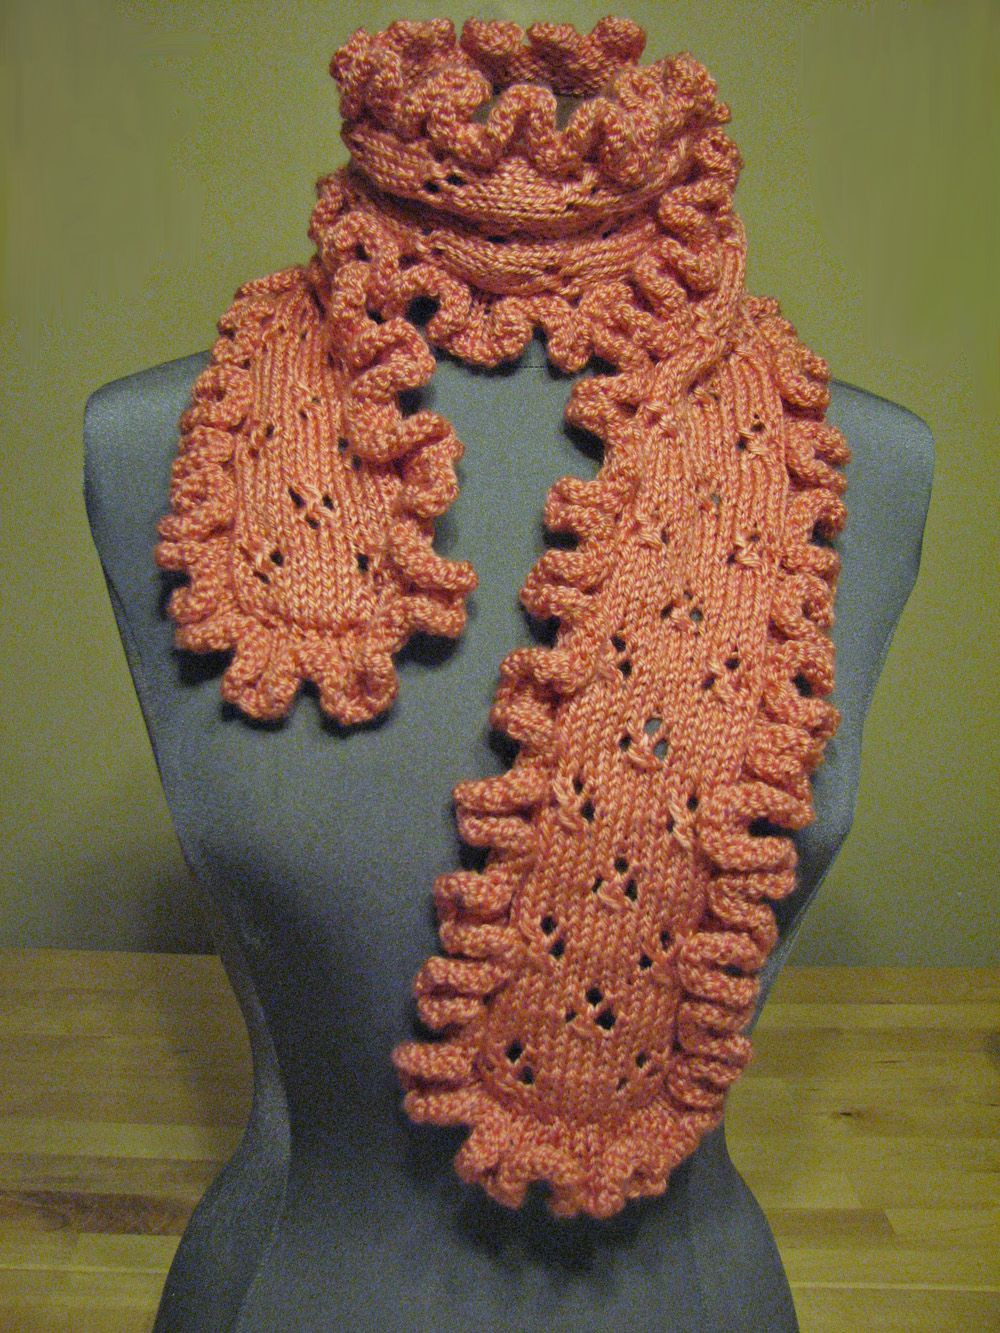 Coral ruffled eyelet lace scarf